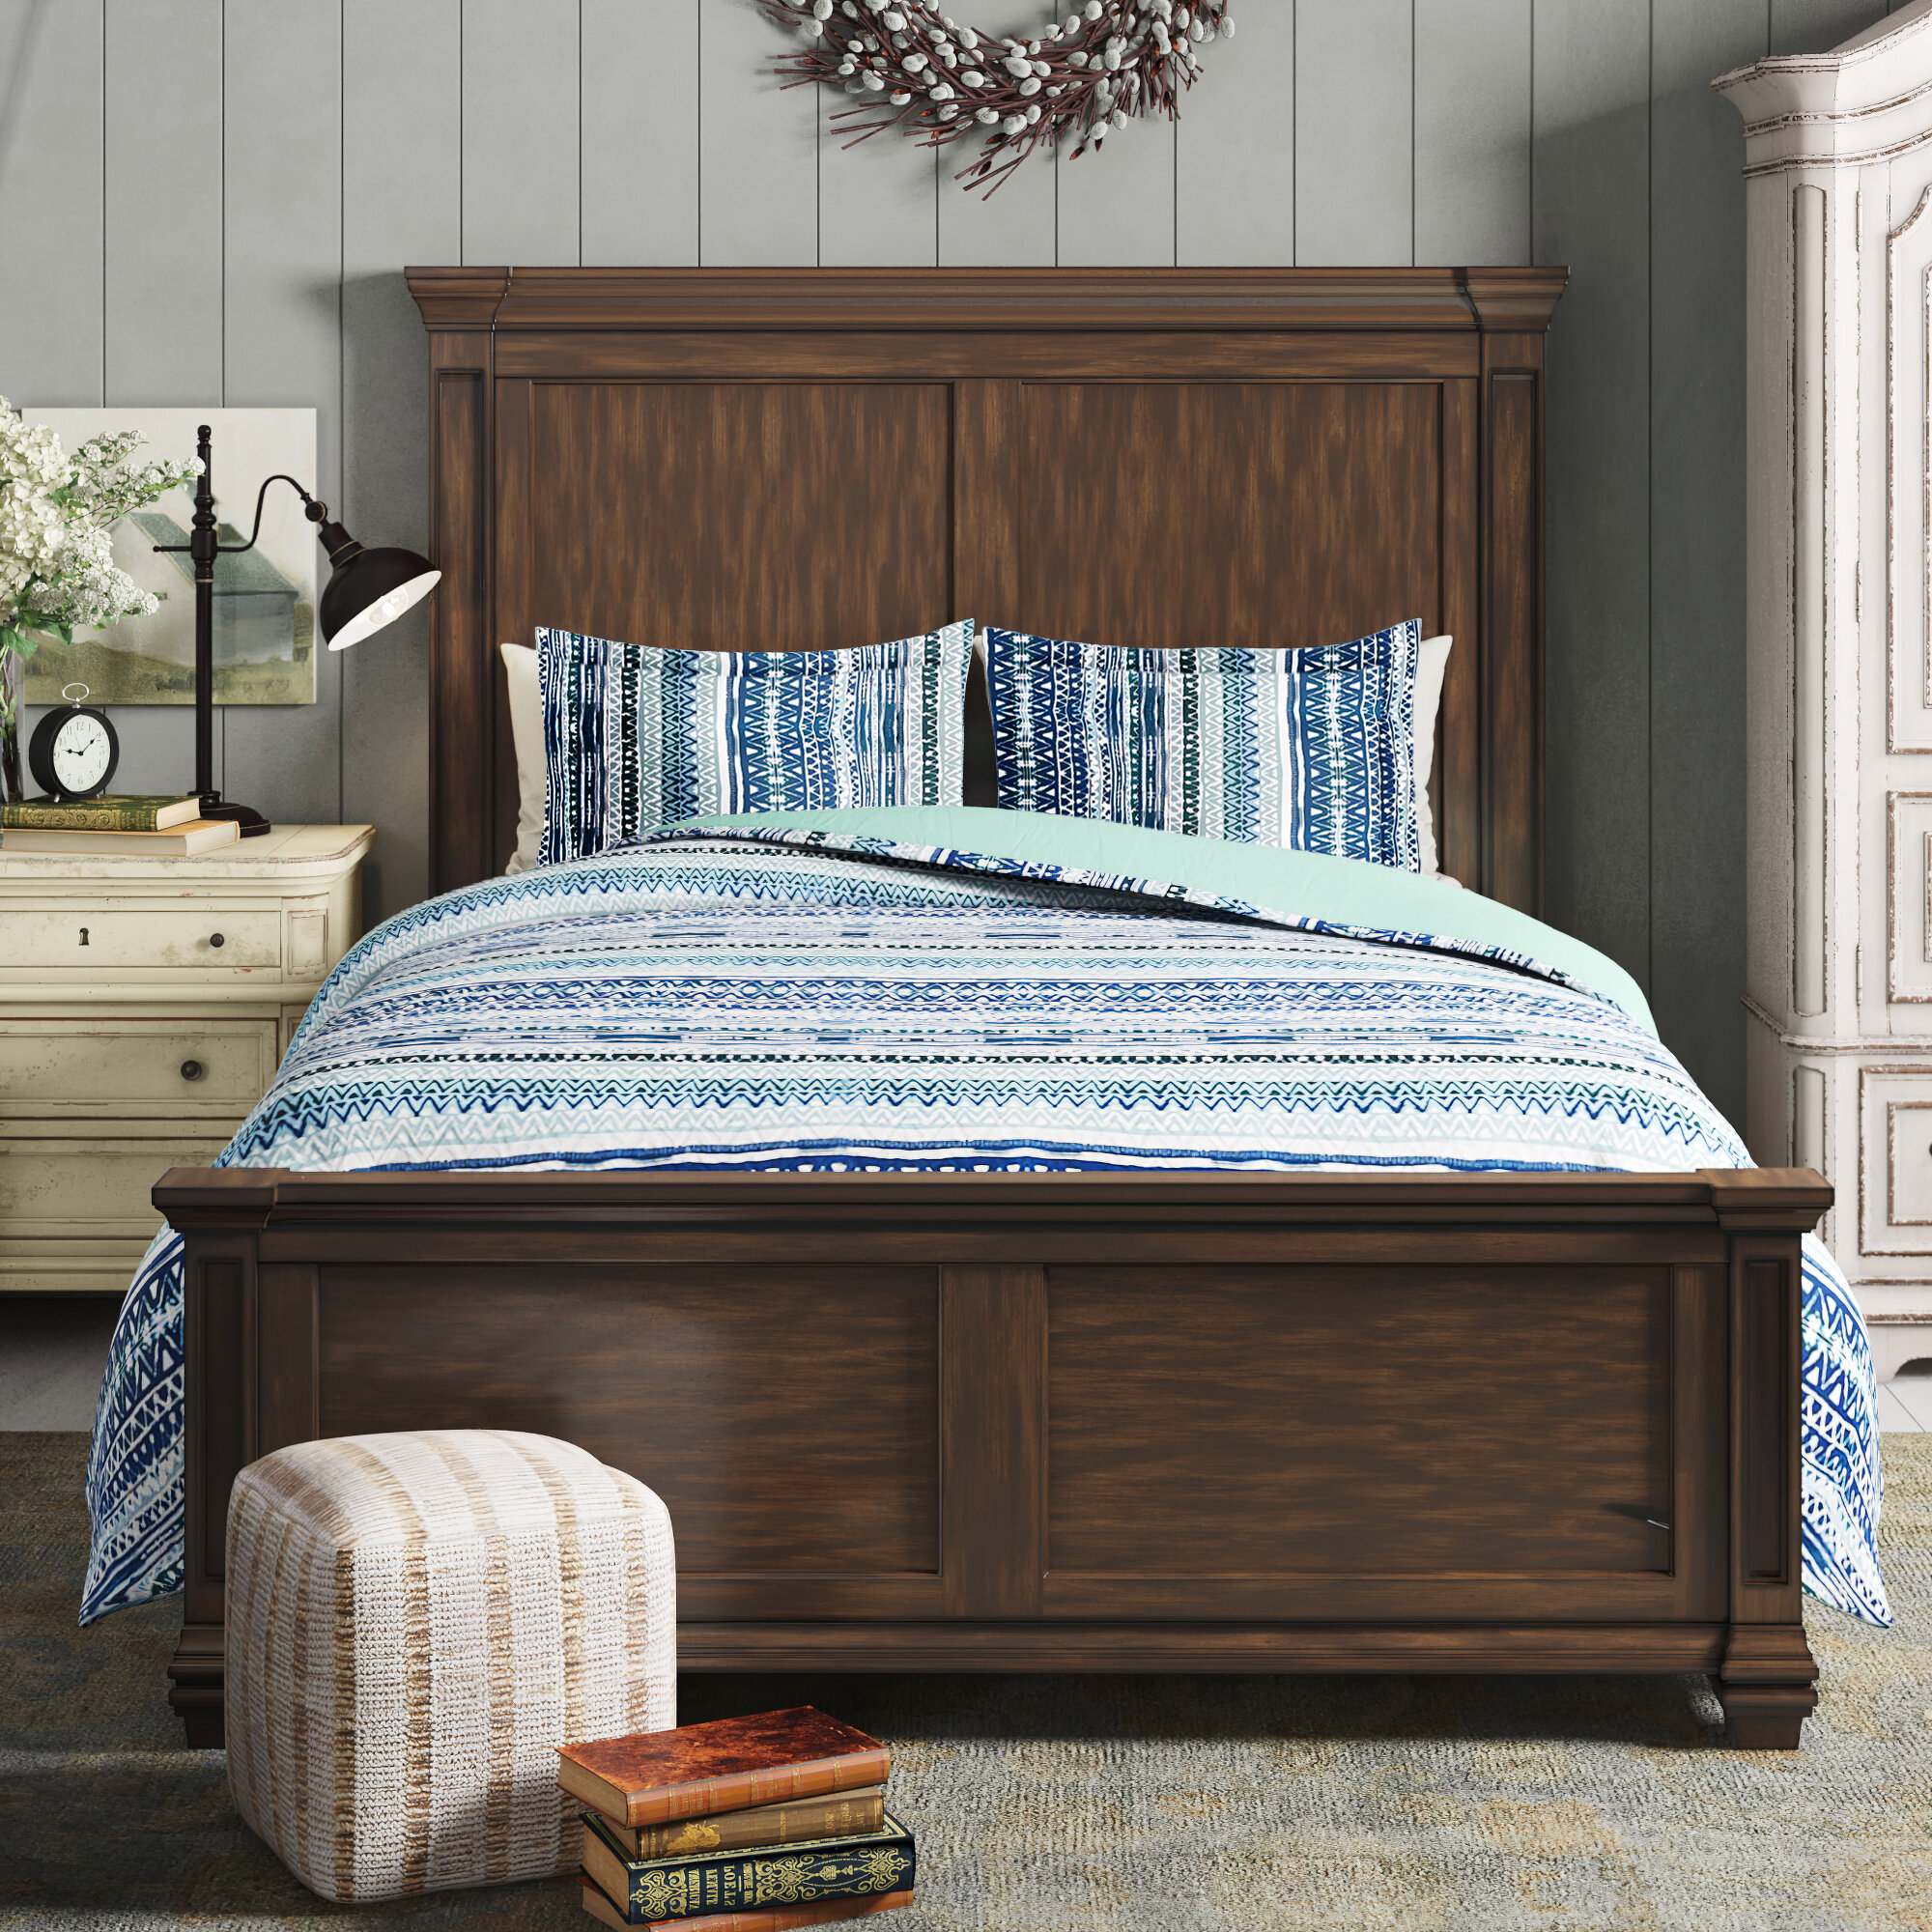 Modern Rustic Bedding Free Shipping Over 35 Wayfair